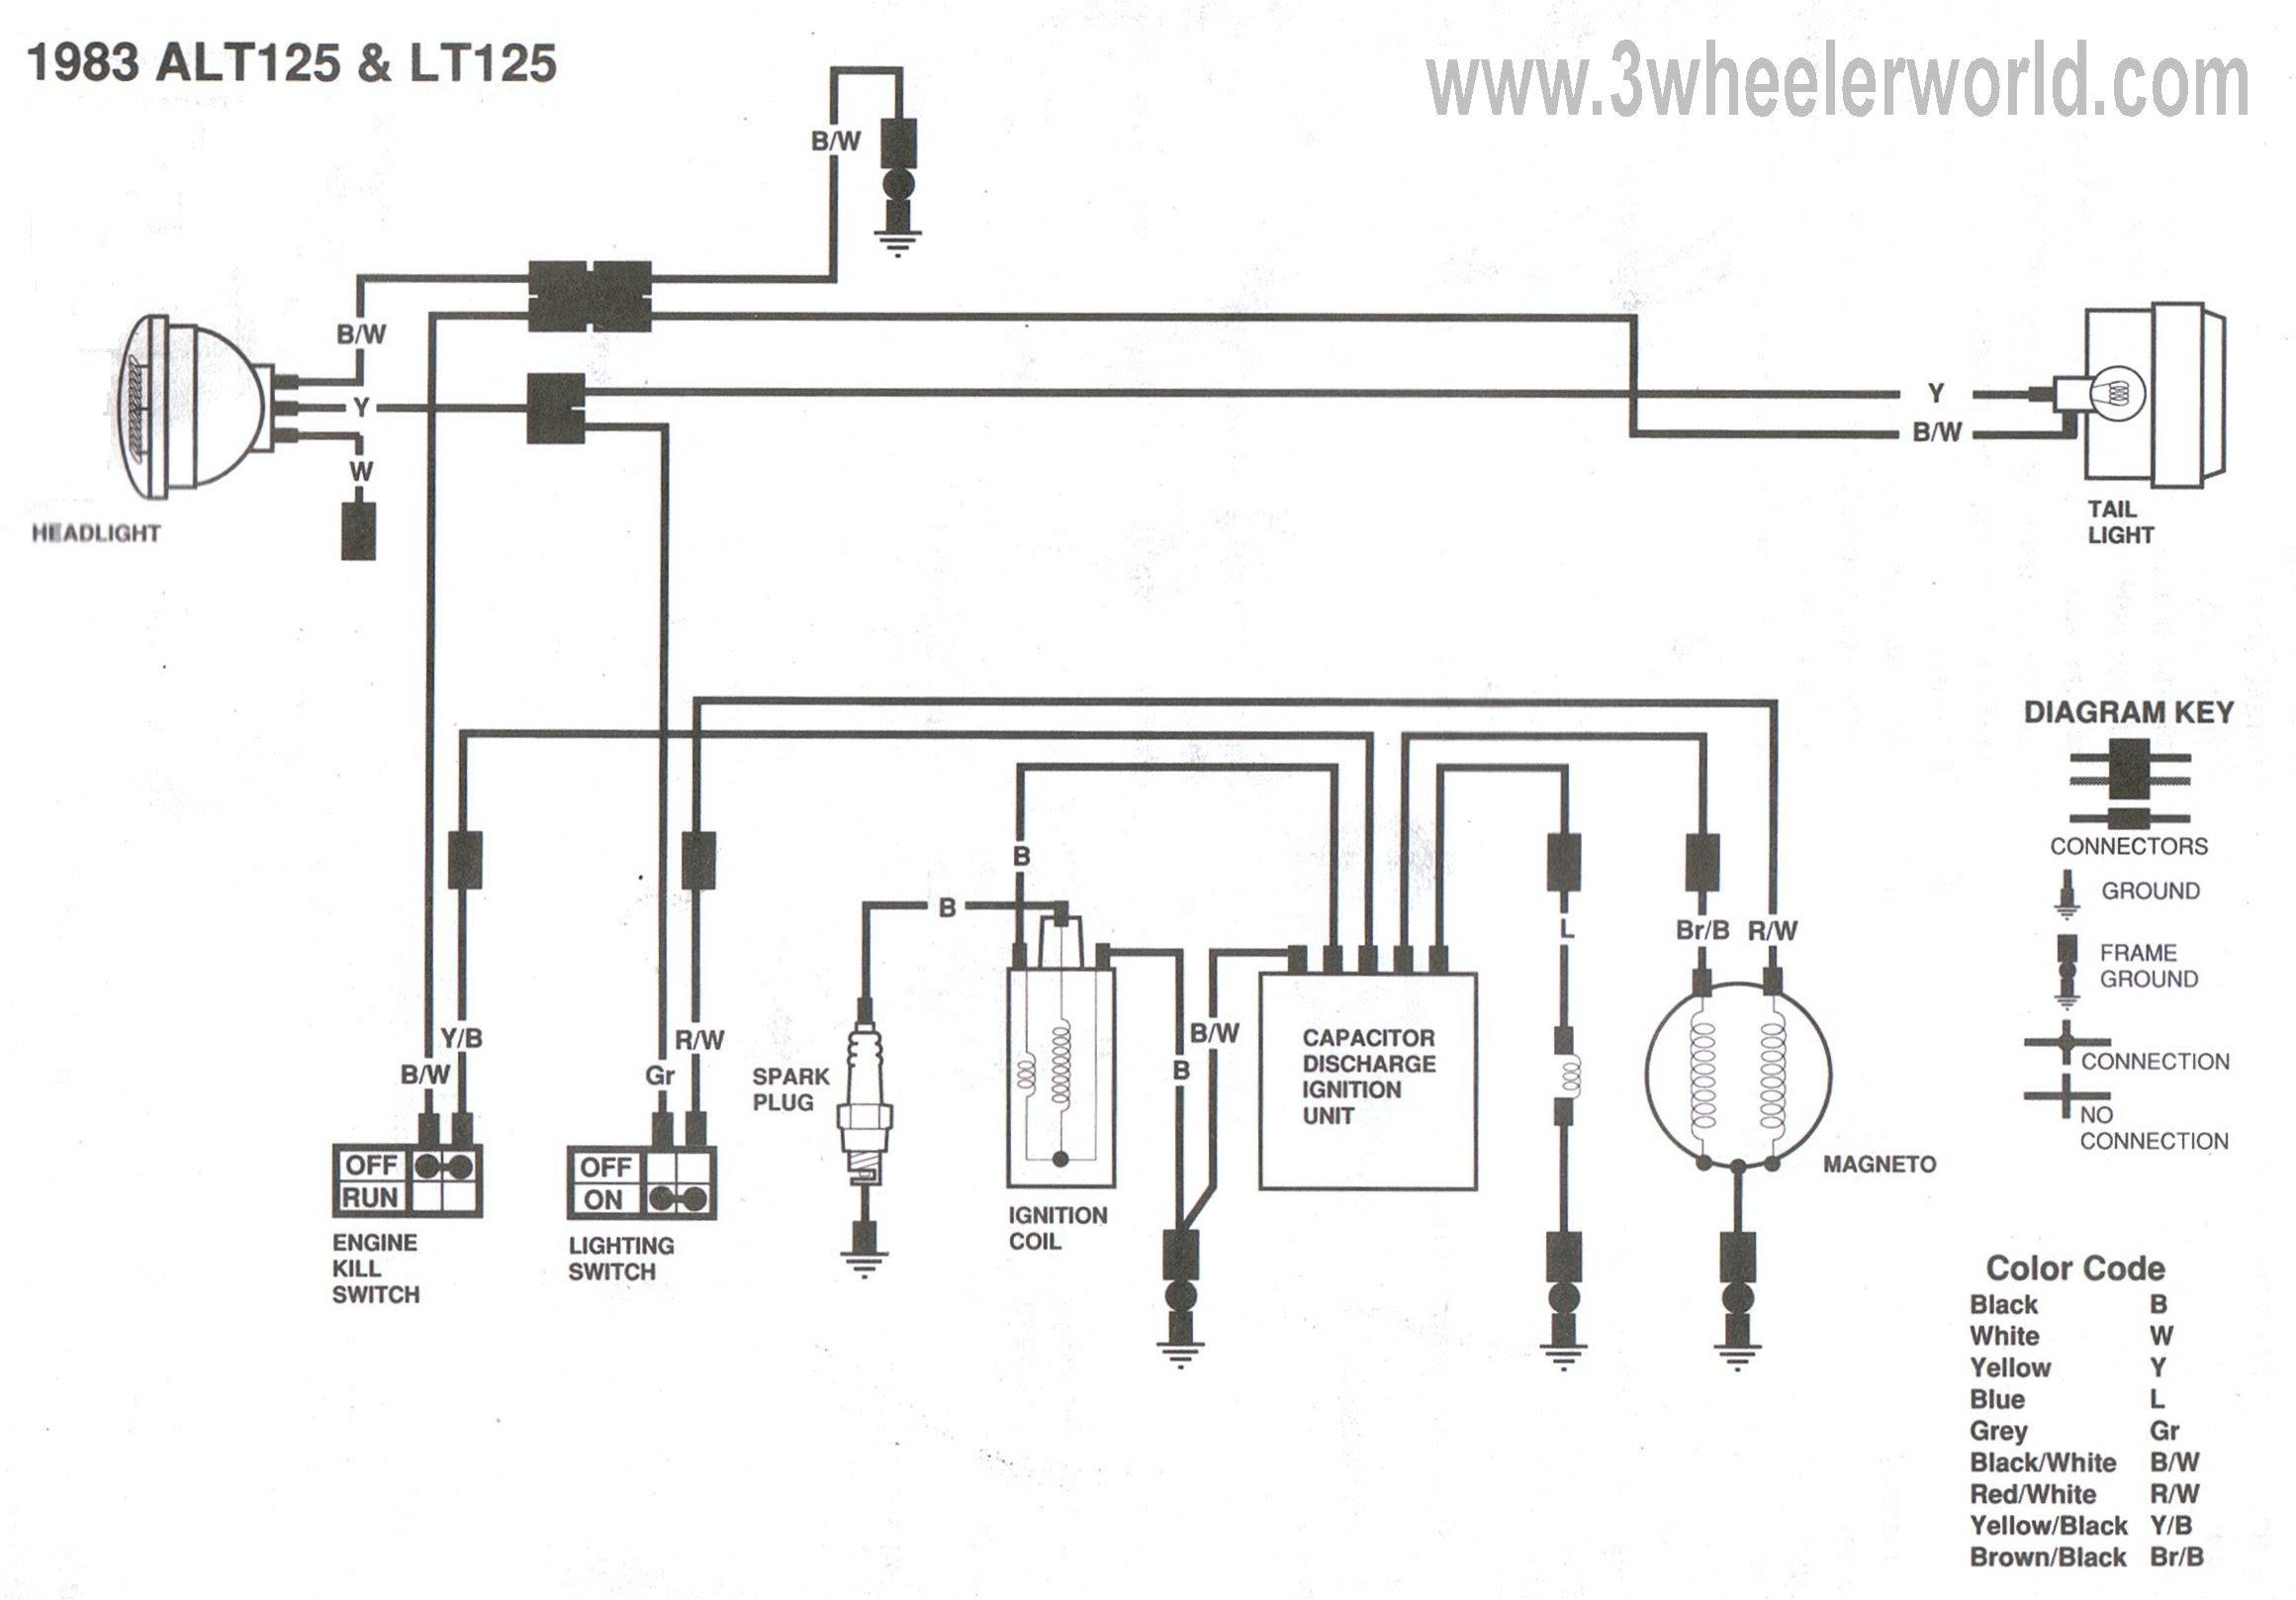 Suzuki King Quad Wiring Harnes - Fuse & Wiring Diagram